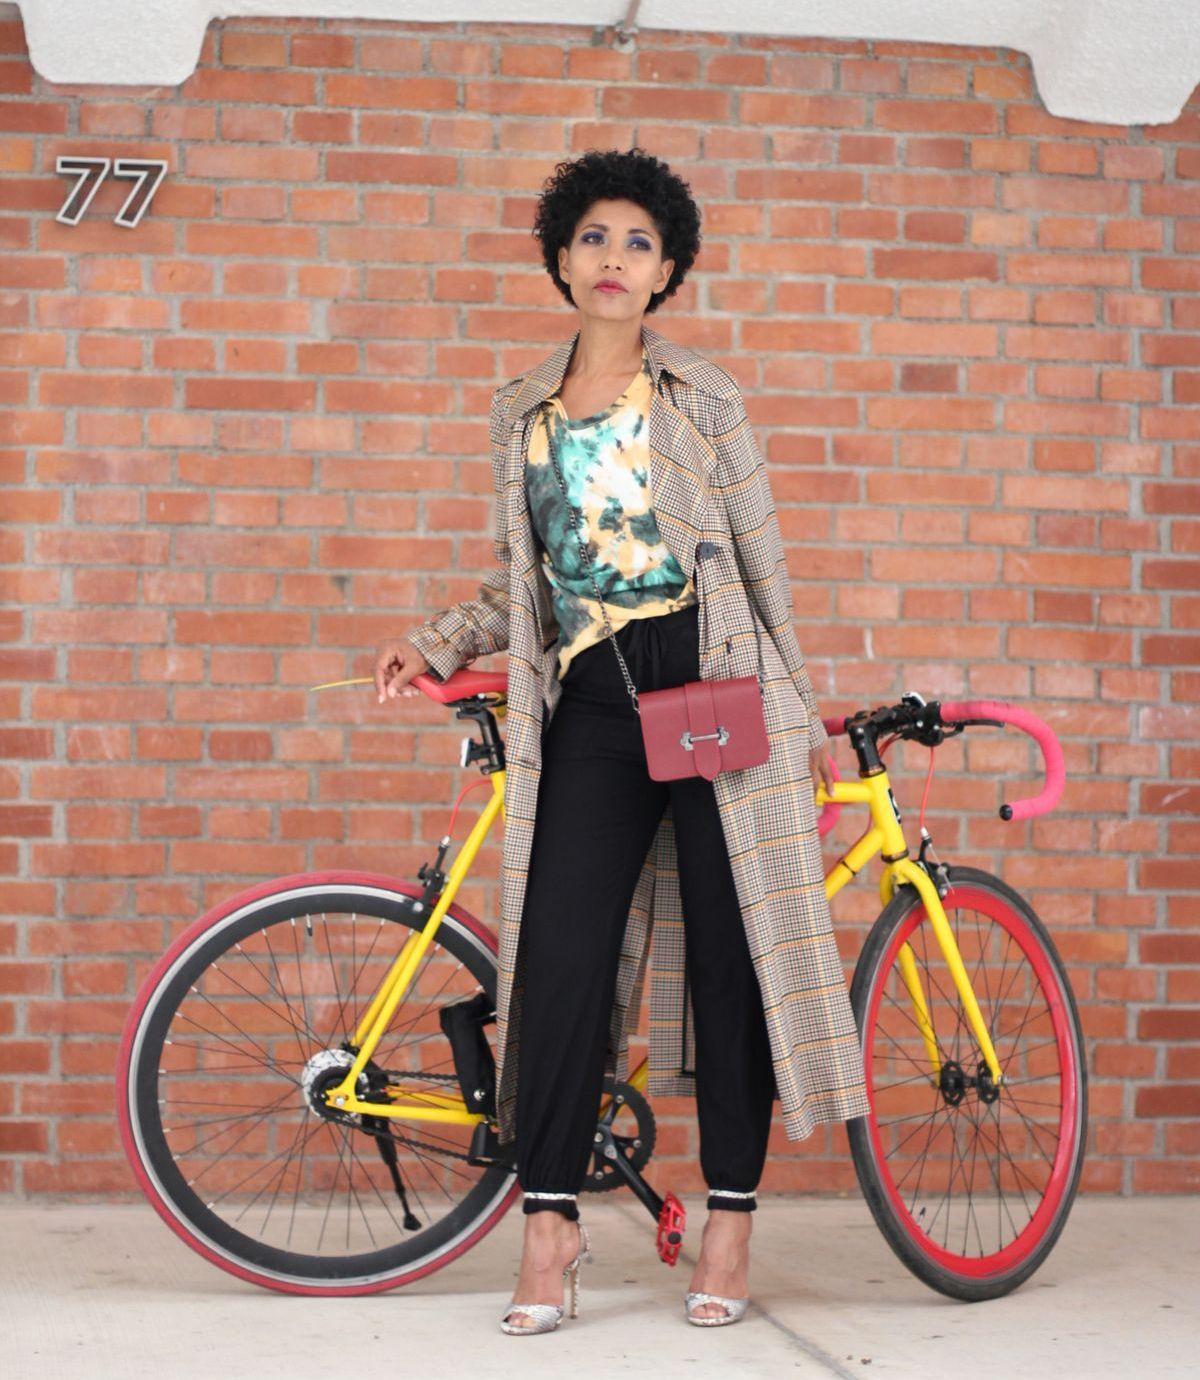 Fahrräder sind aktuell ultra-beliebt